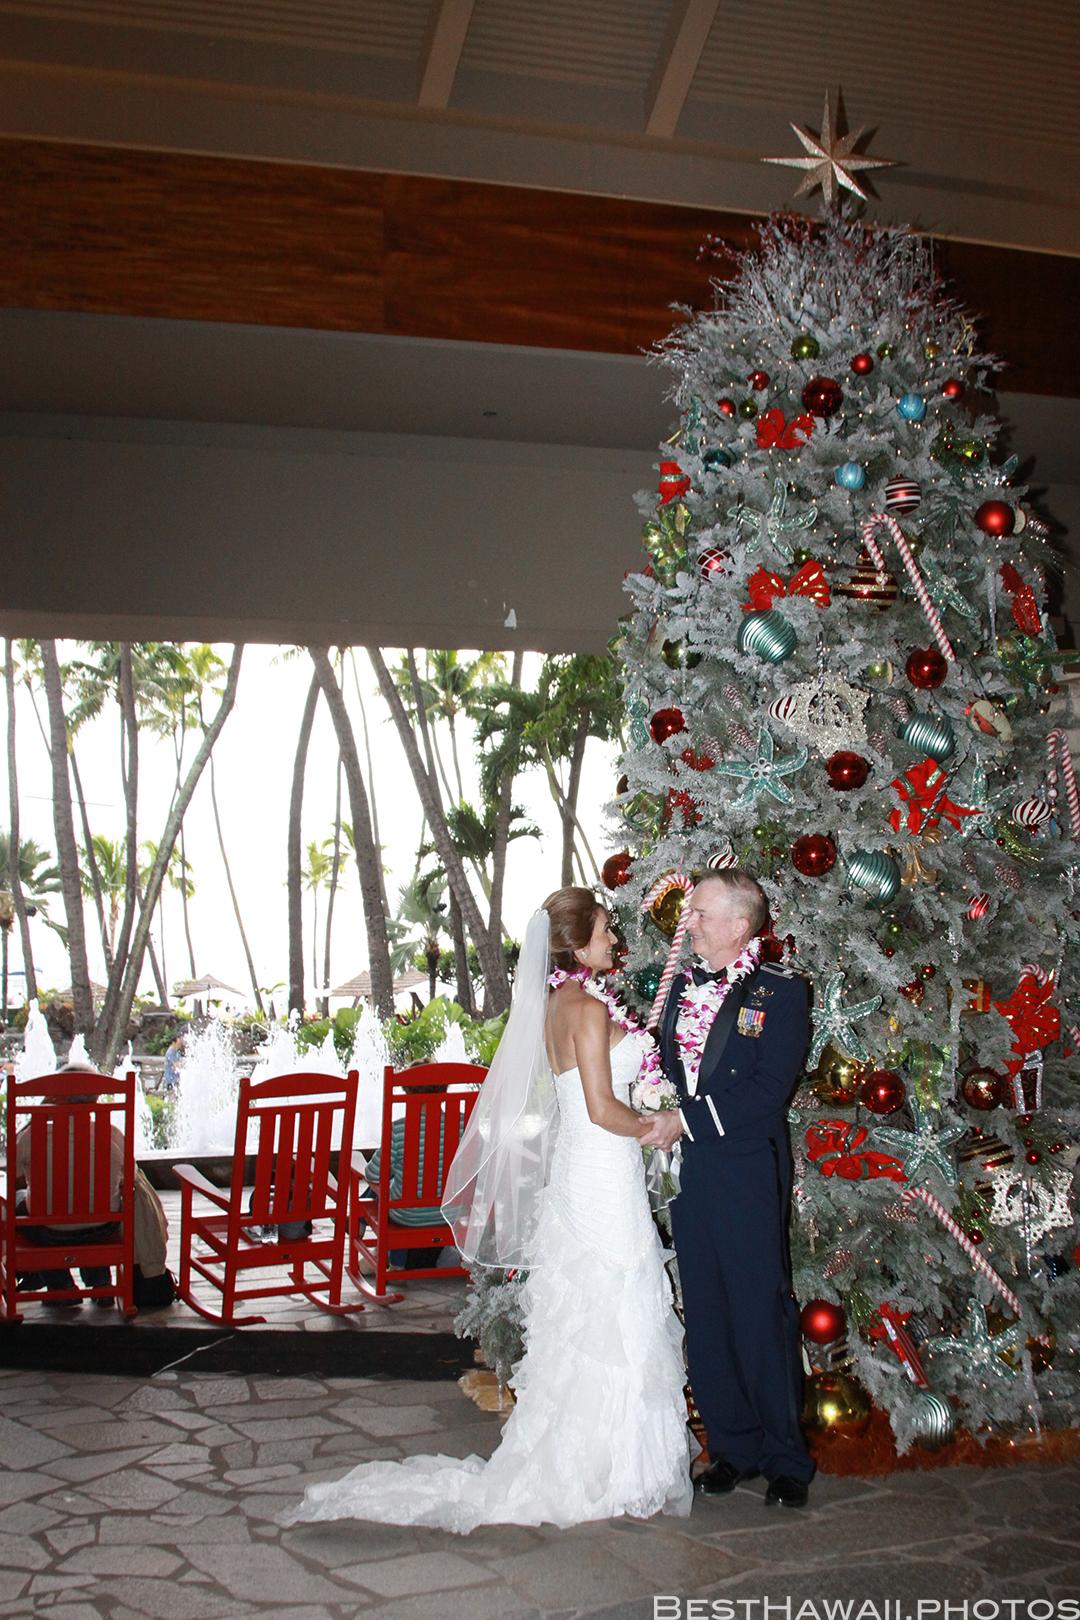 Wedding Photos at Hilton Hawaiian Village by Pasha www.BestHawaii.photos 121820158665